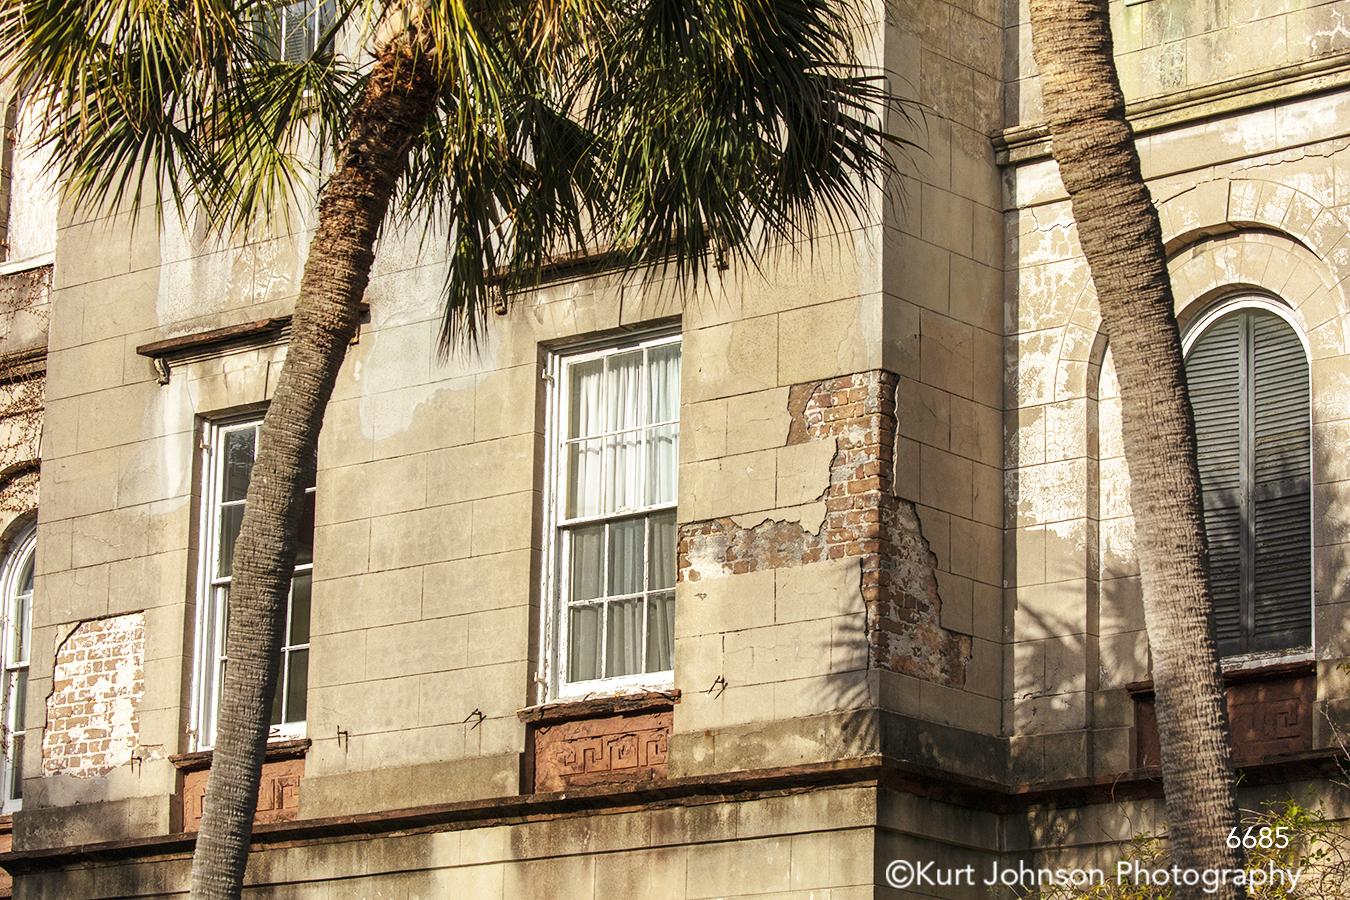 southeast Charleston South Carolina green palm tree window building architecture city